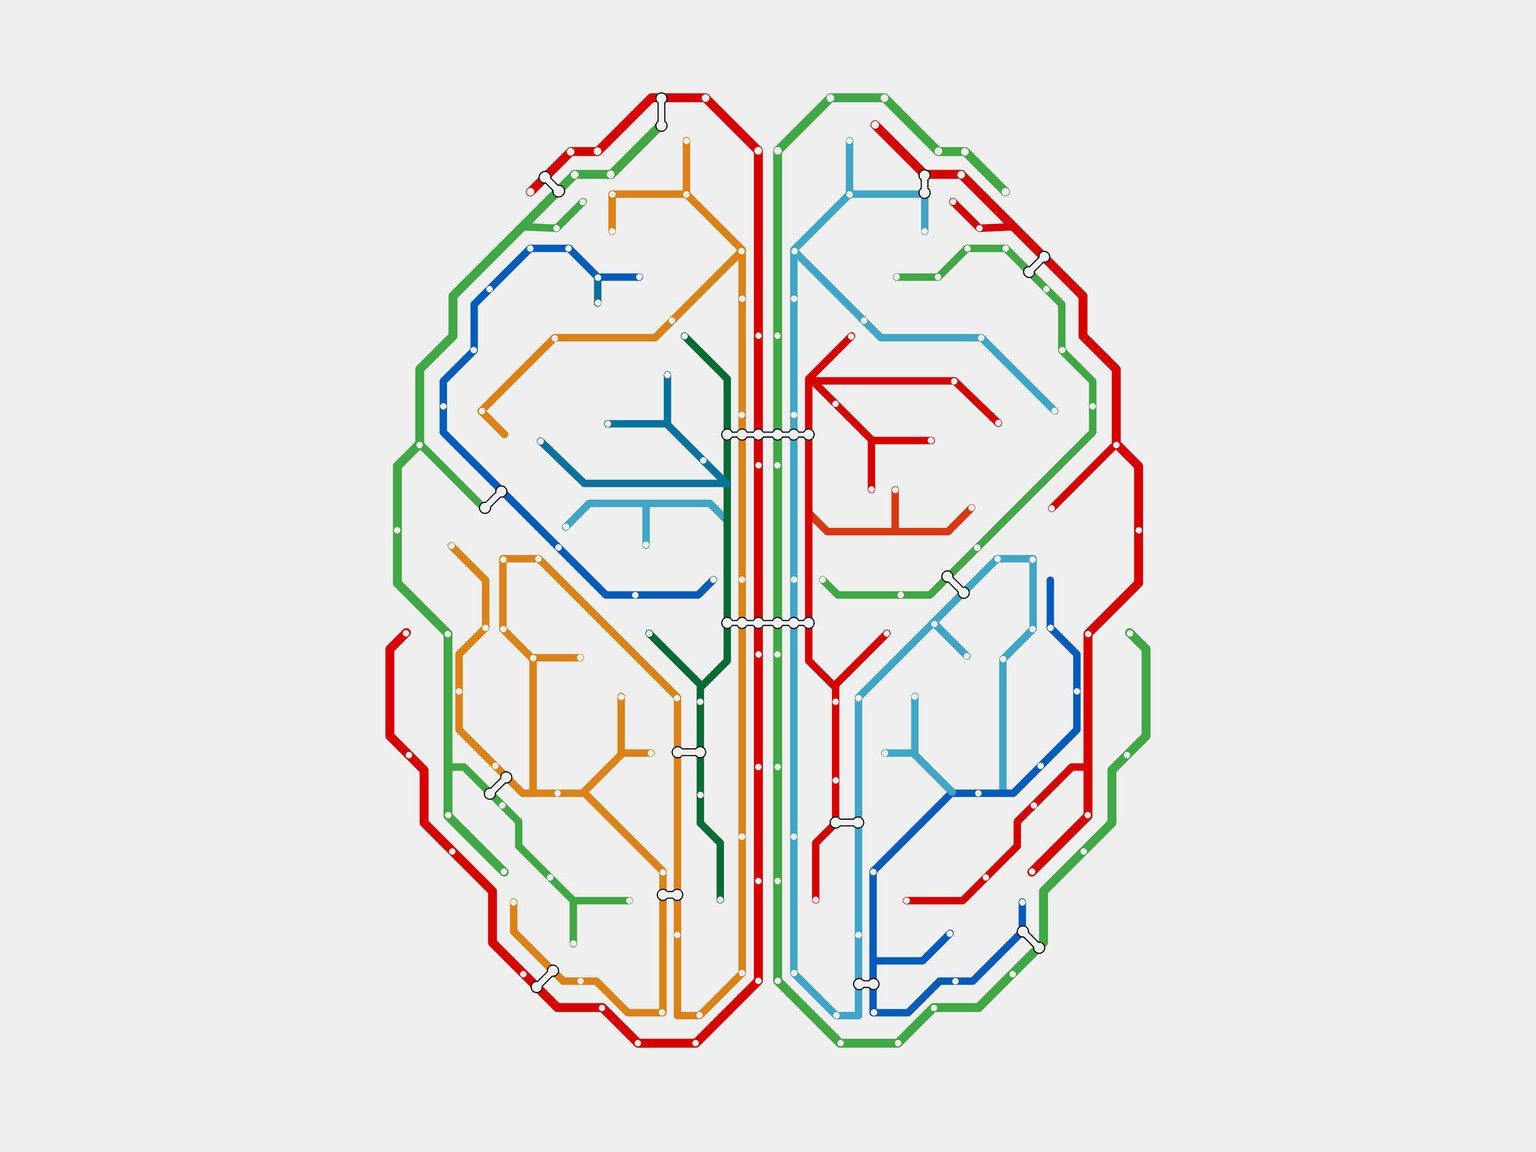 machine-learning-curriculum | :computer: Make machines learn